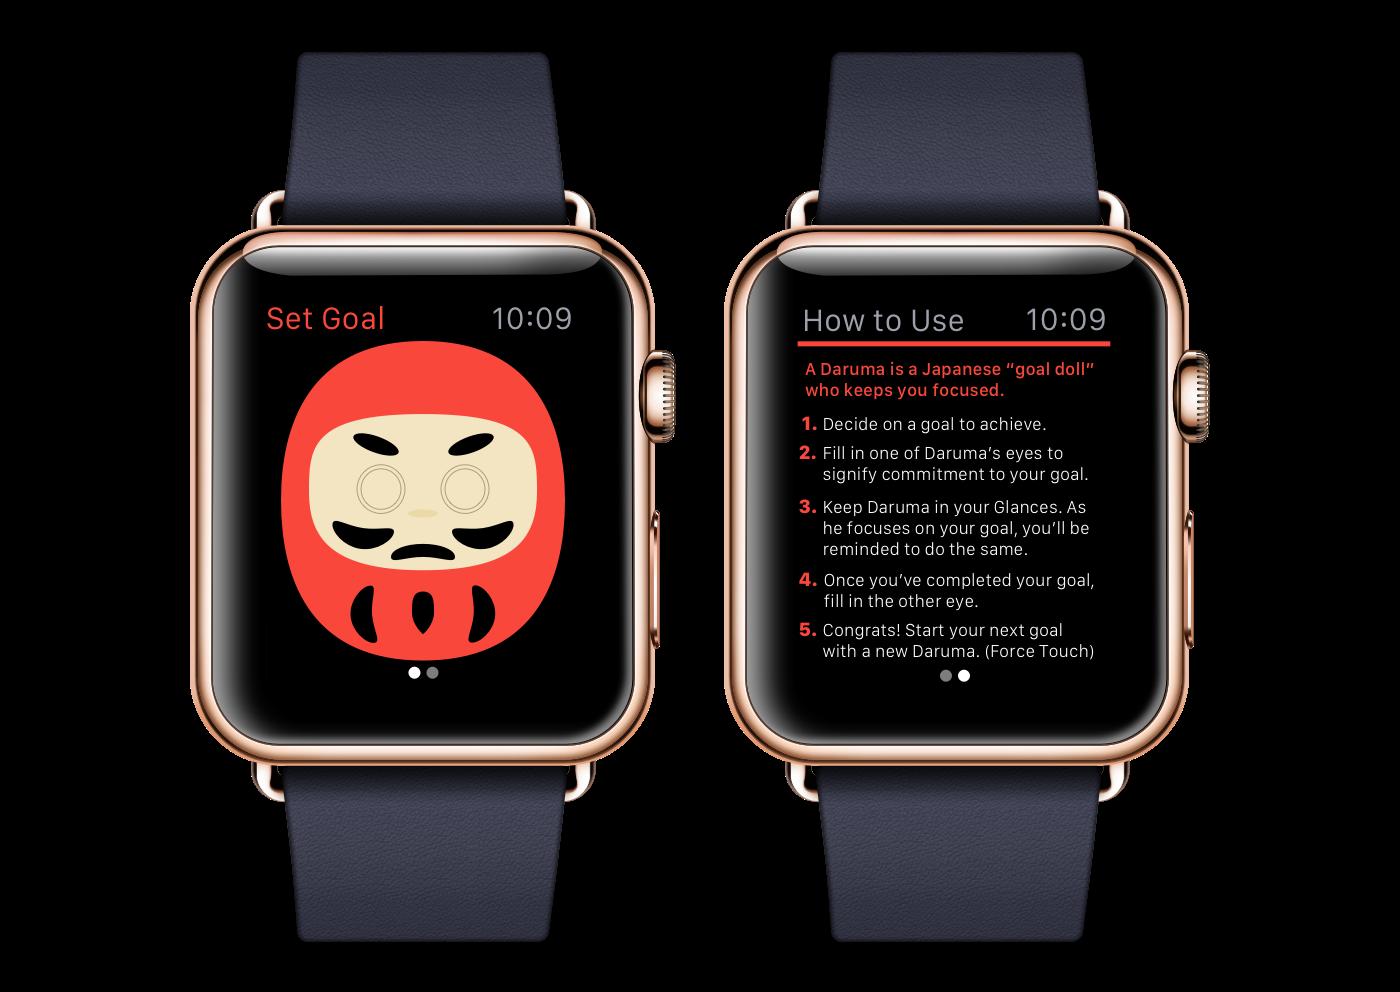 apple watch wearables Human interface design app